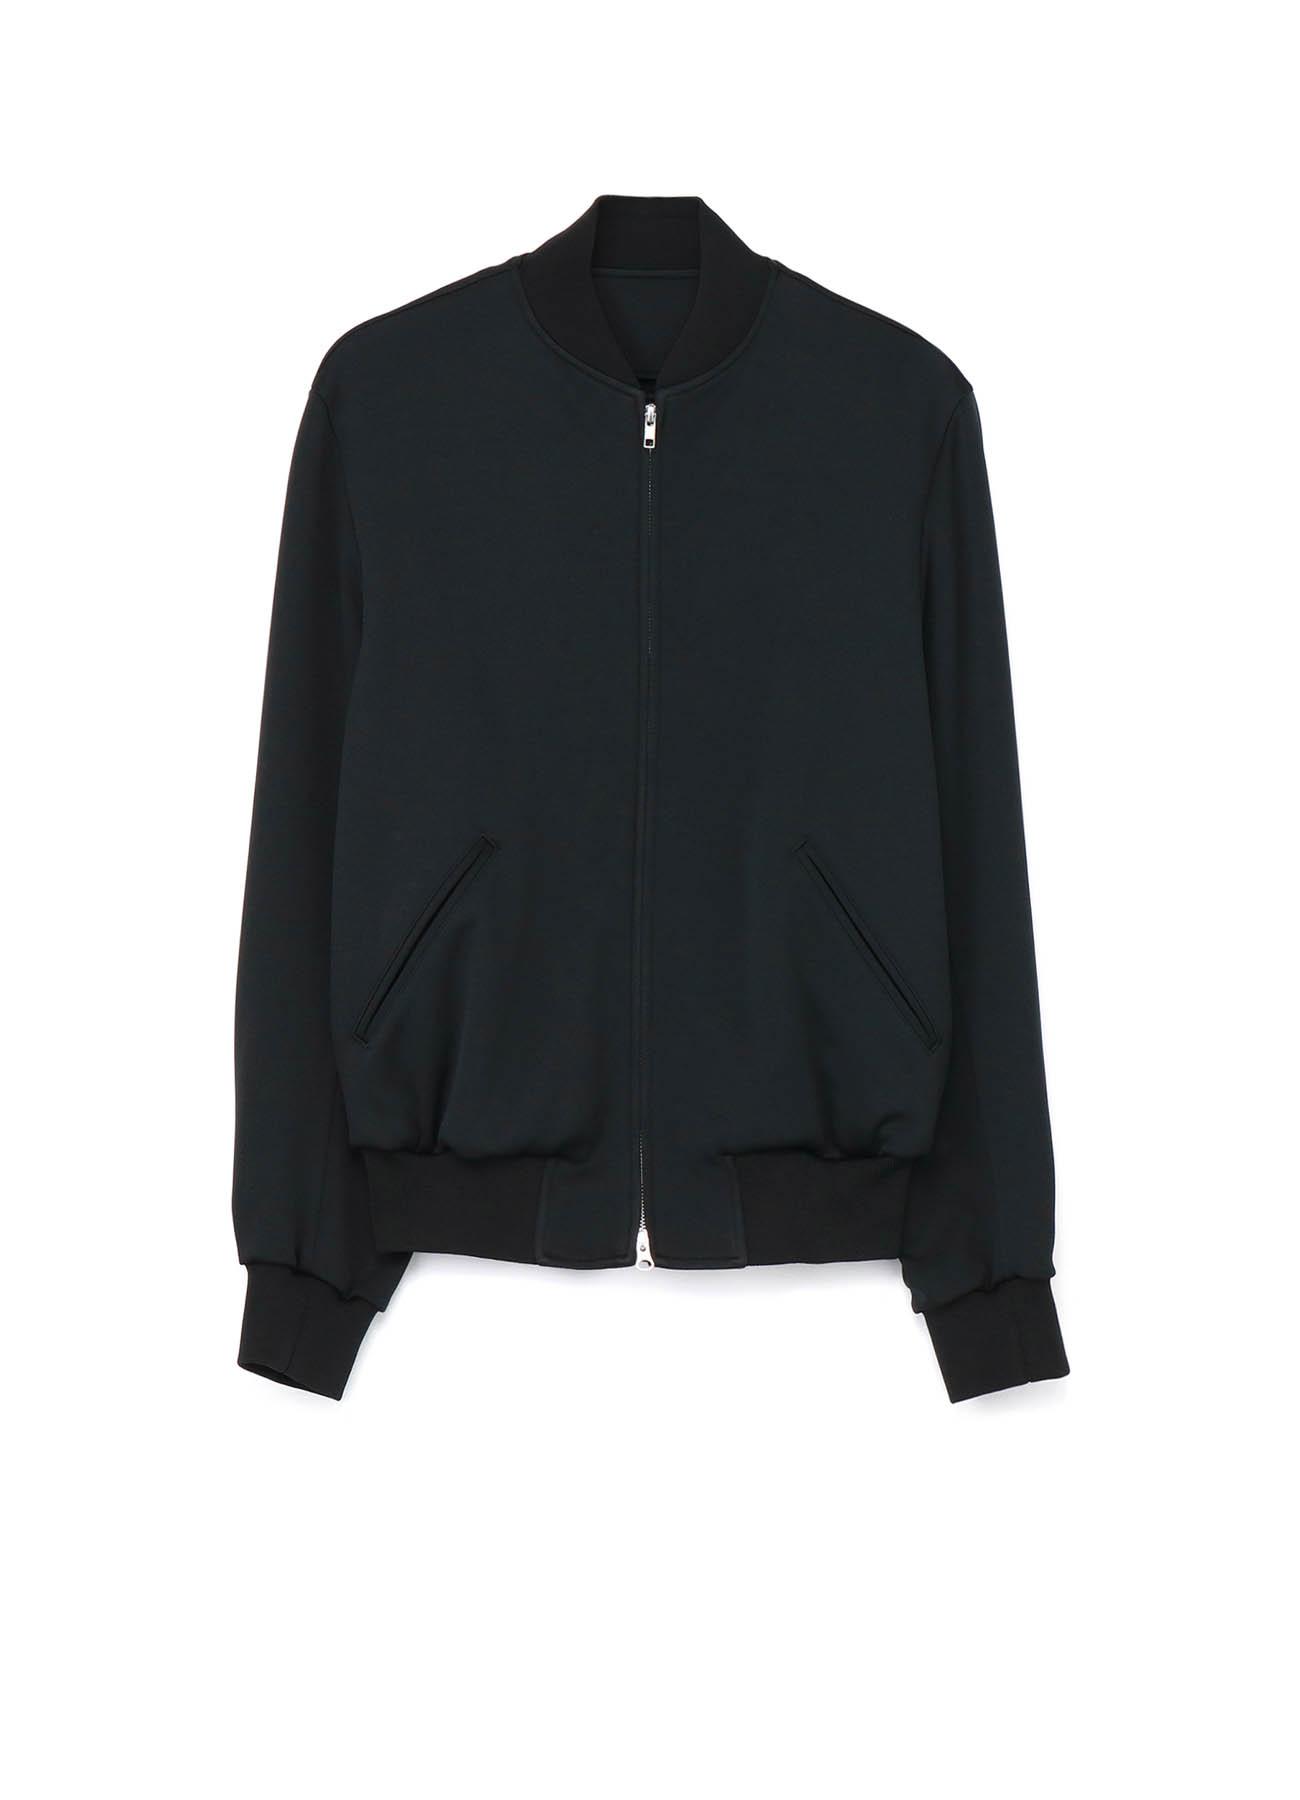 30/Pe Jersey Short Jacket